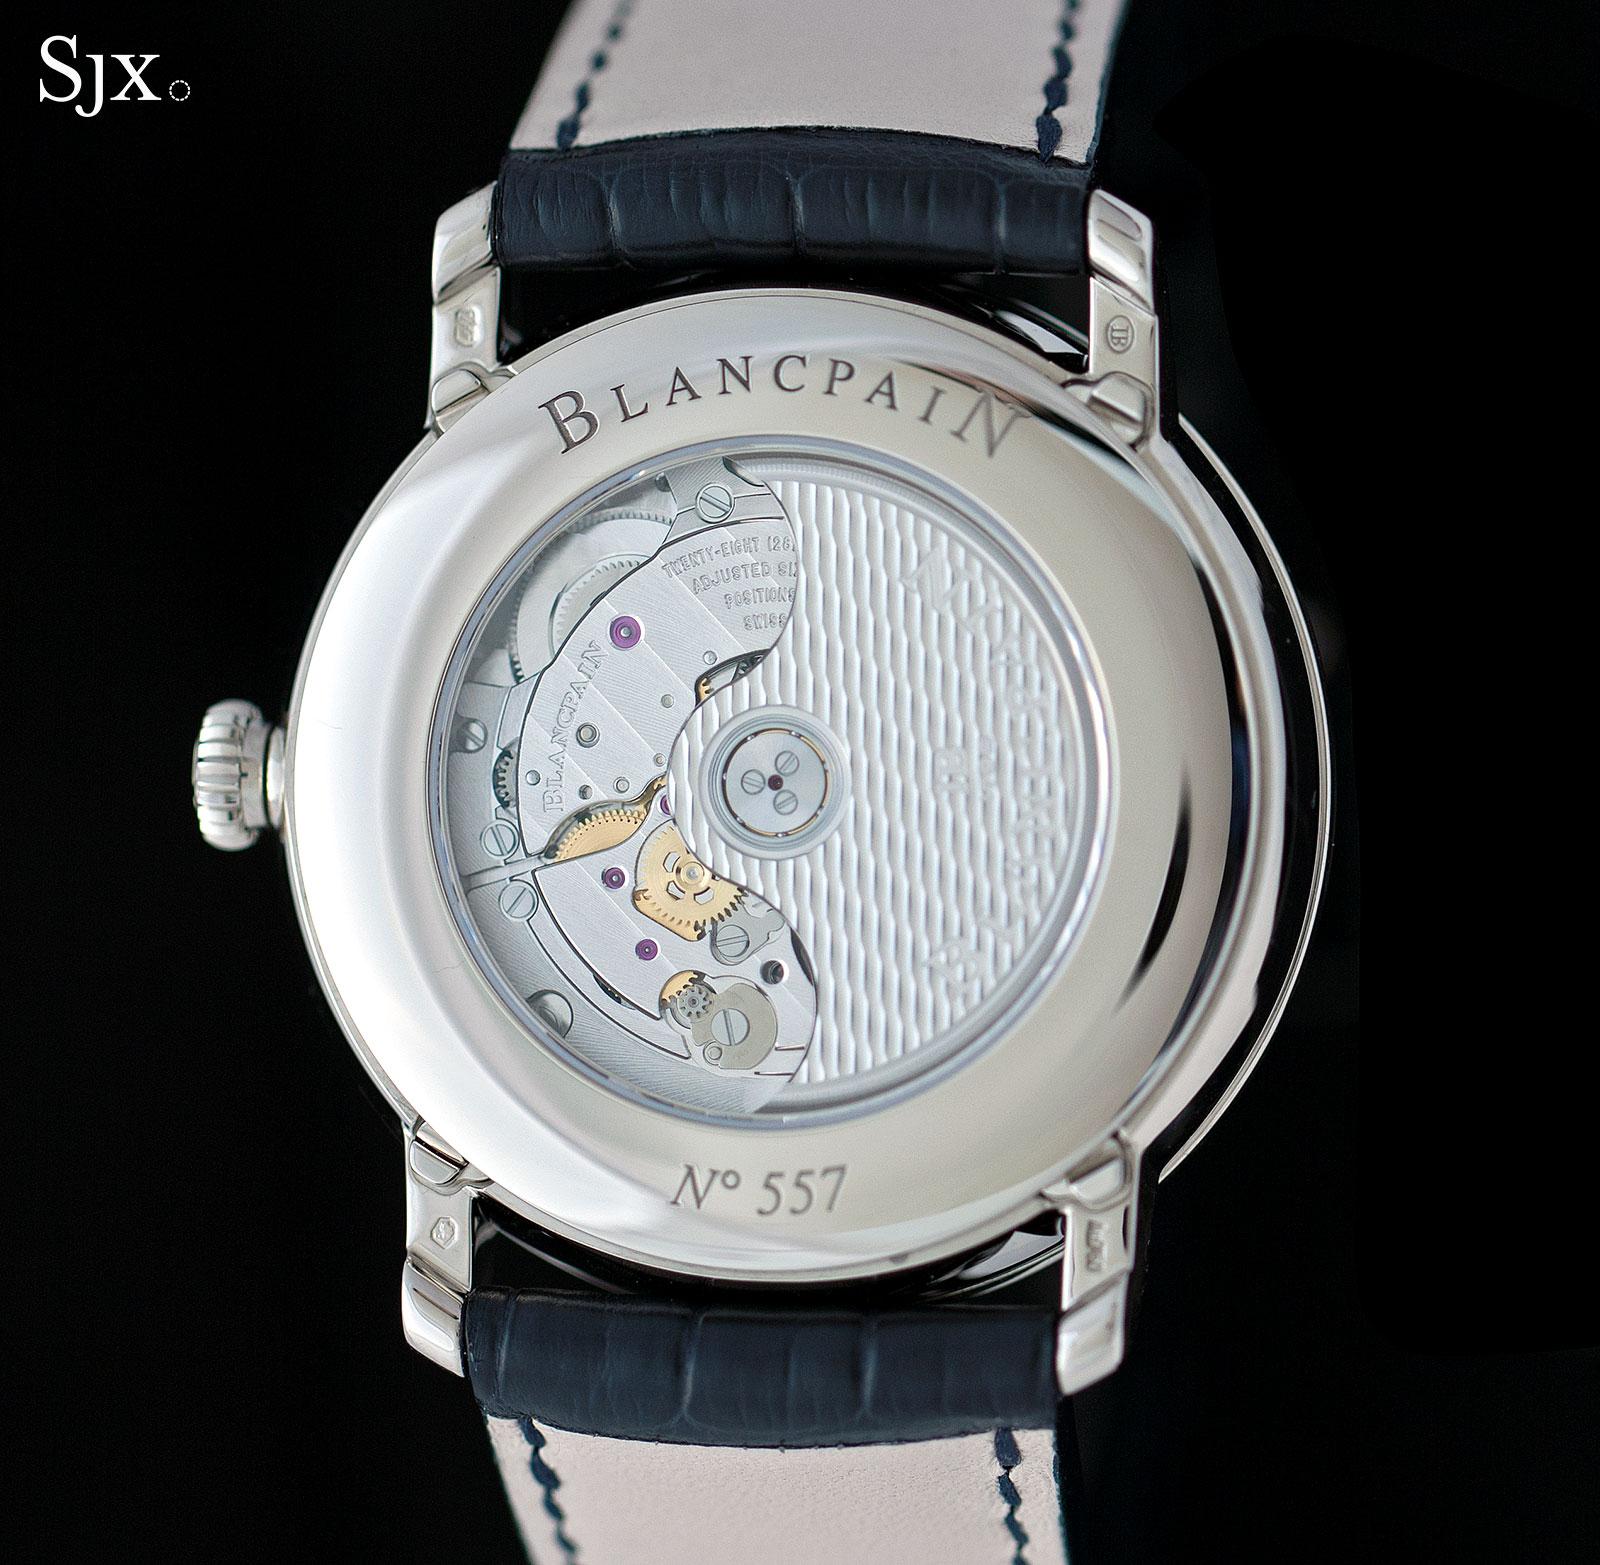 blancpain-complete-calendar-white-gold-9.jpg